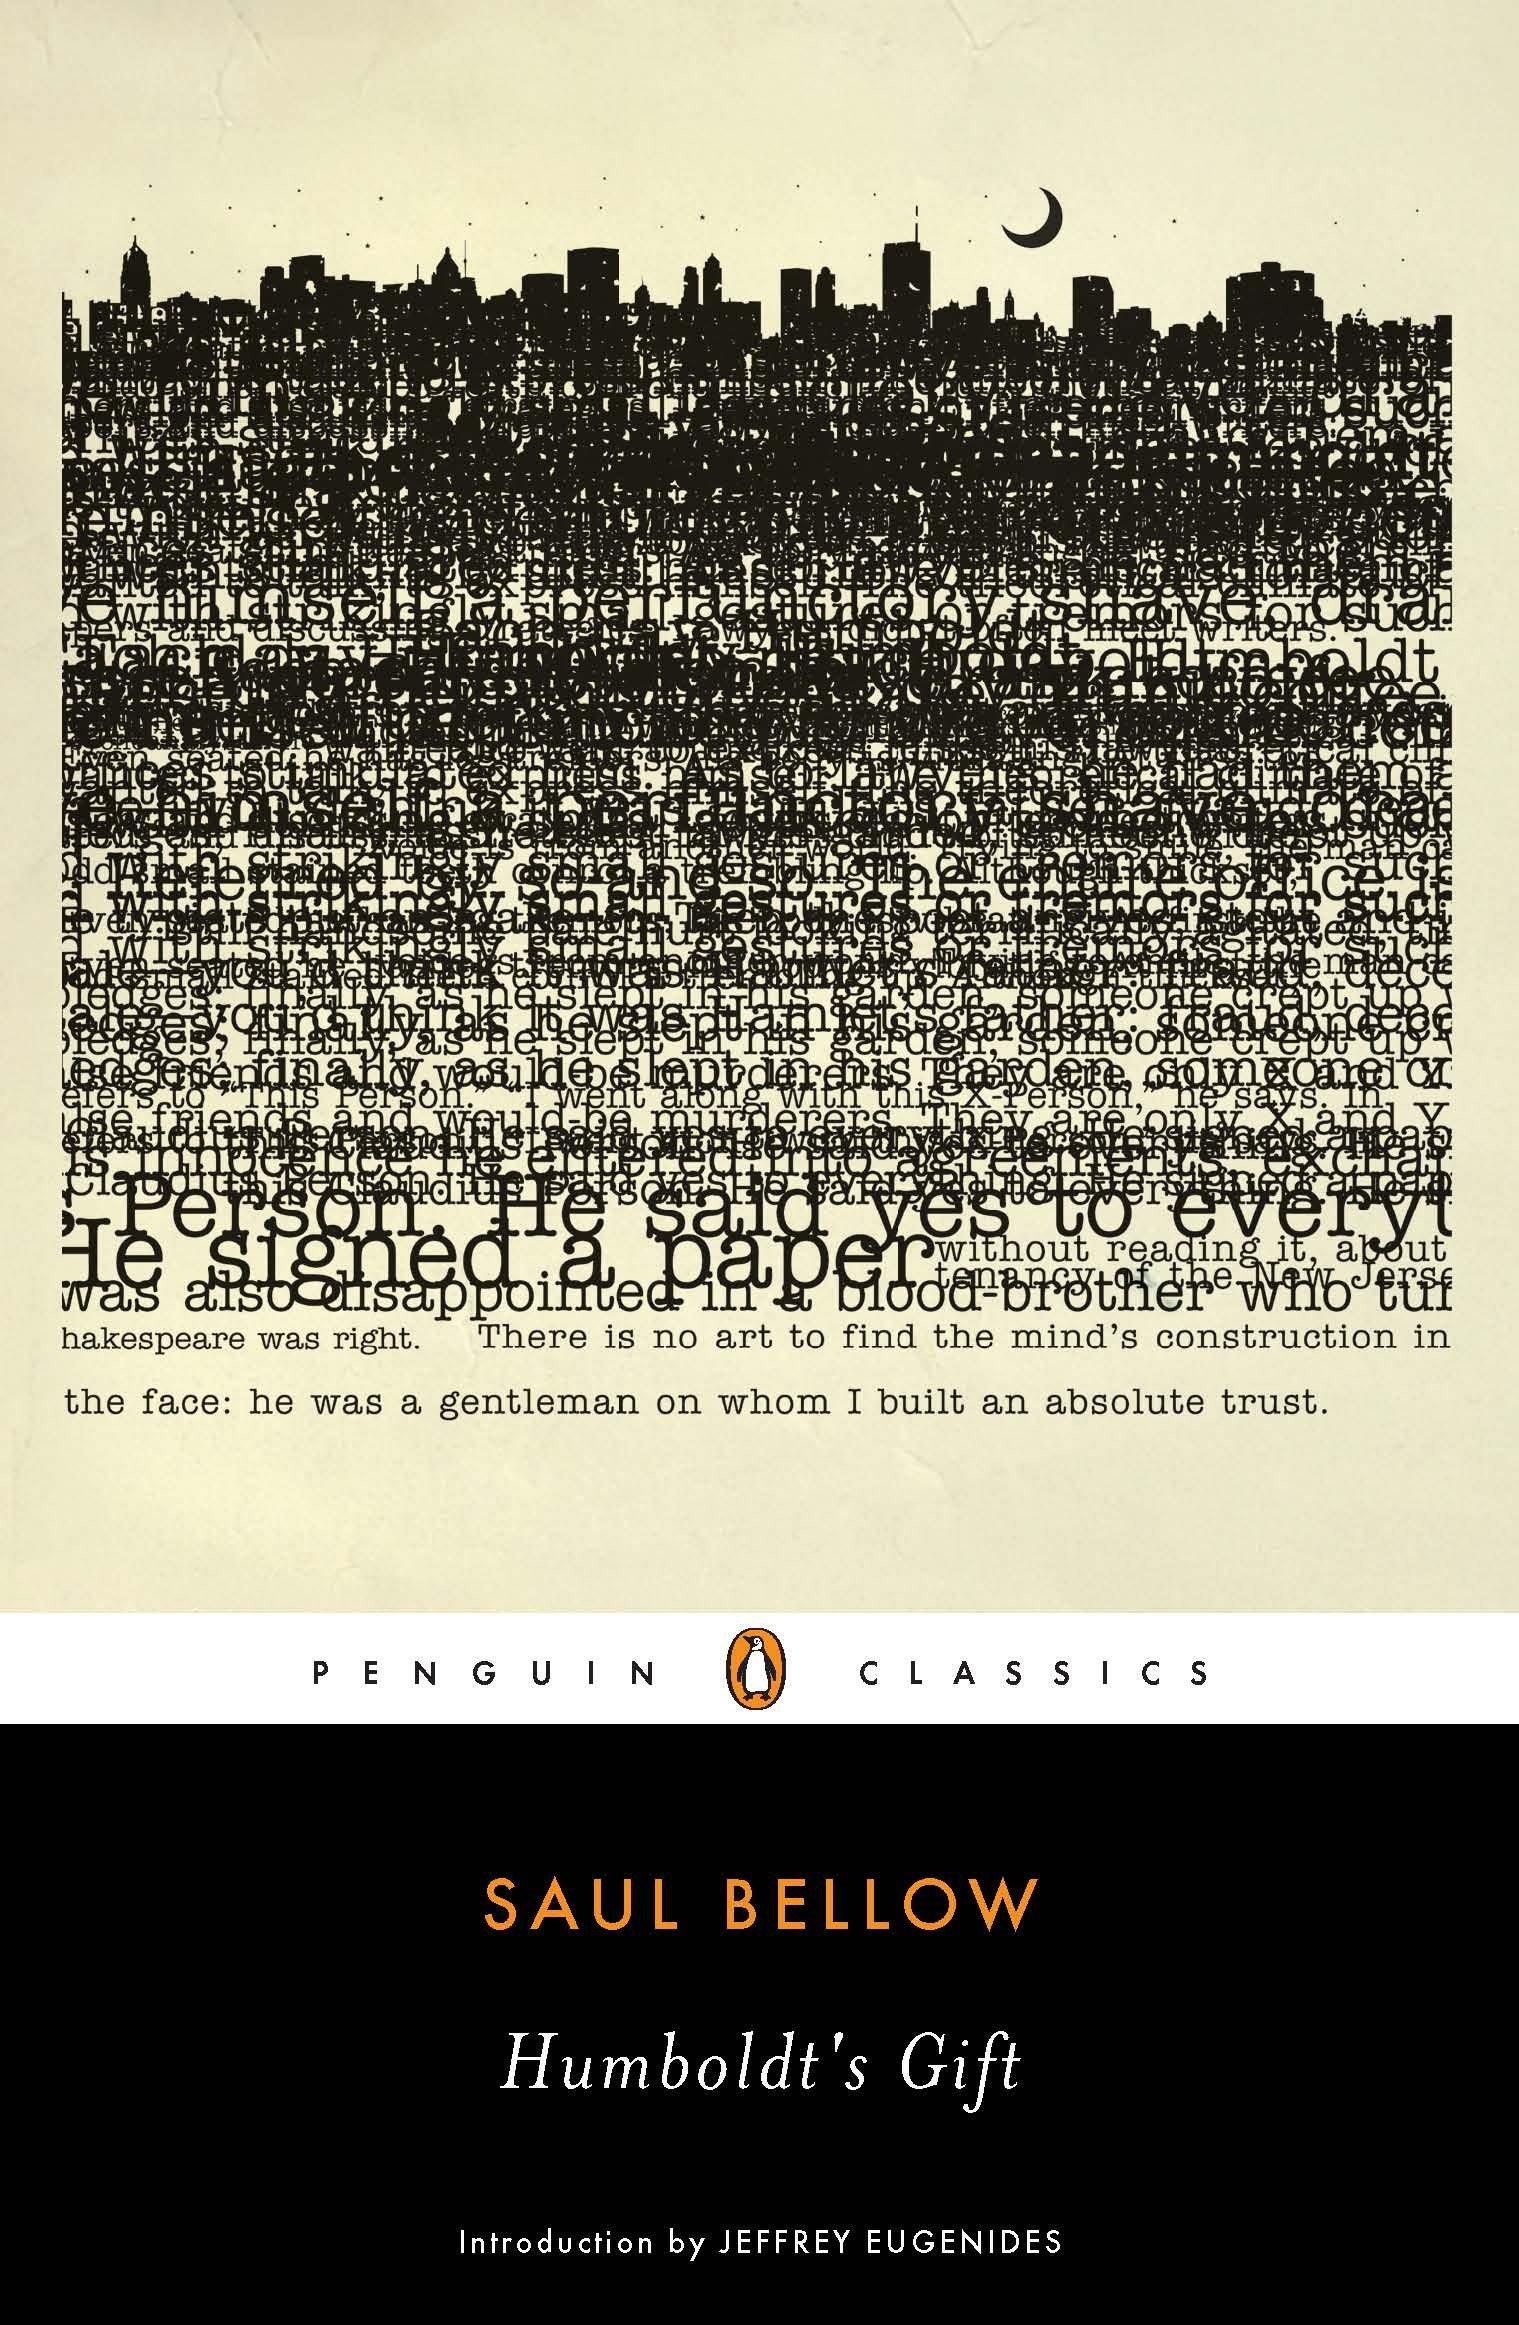 Humboldt's Gift (Penguin Classics): Bellow, Saul, Eugenides ...